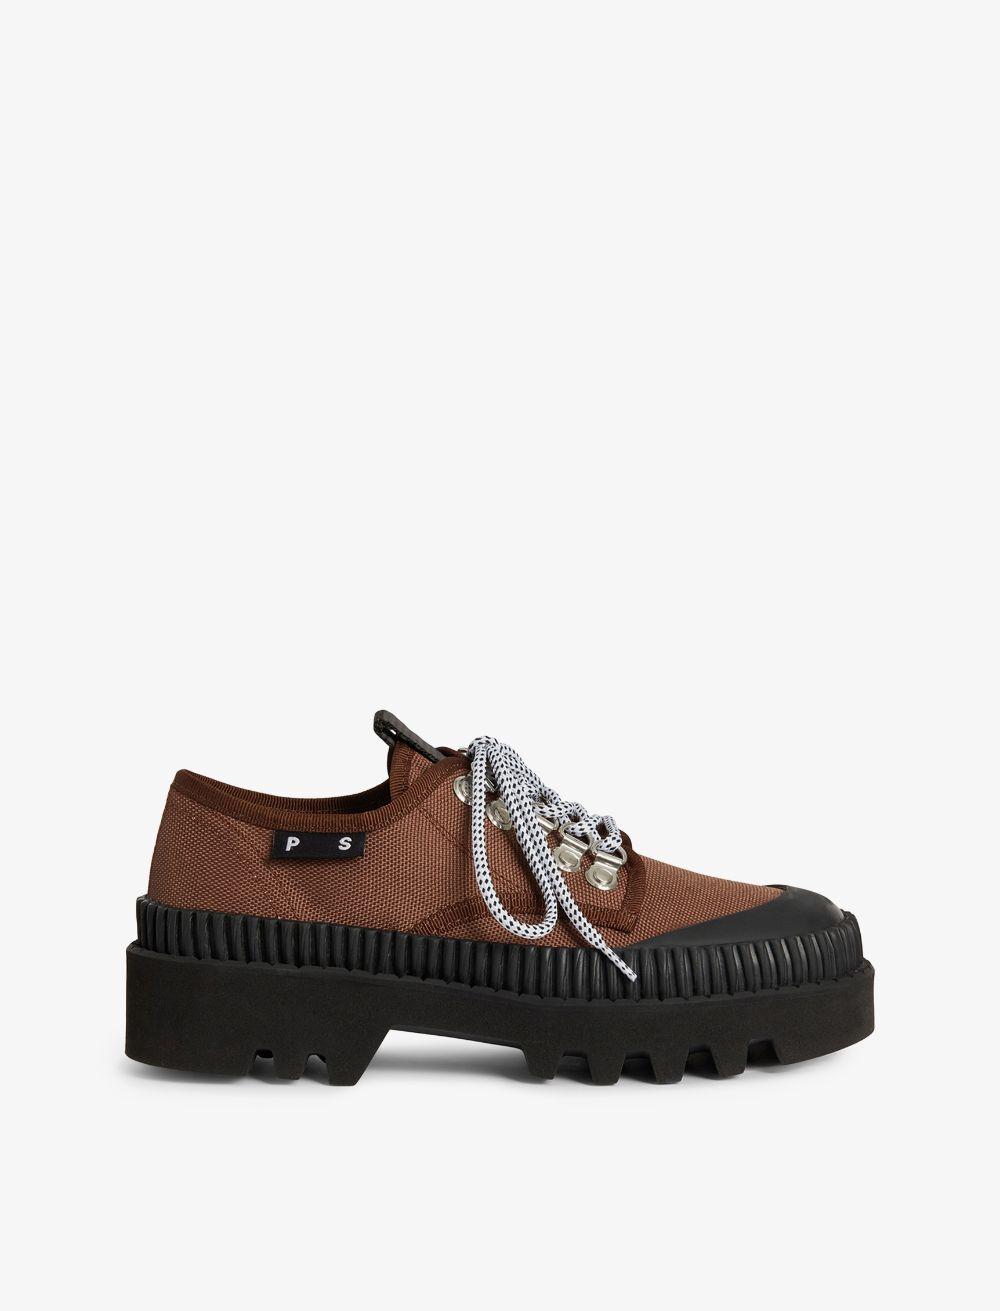 Proenza Schouler City Lug Sole Shoes 521 cinnamon/brown 40